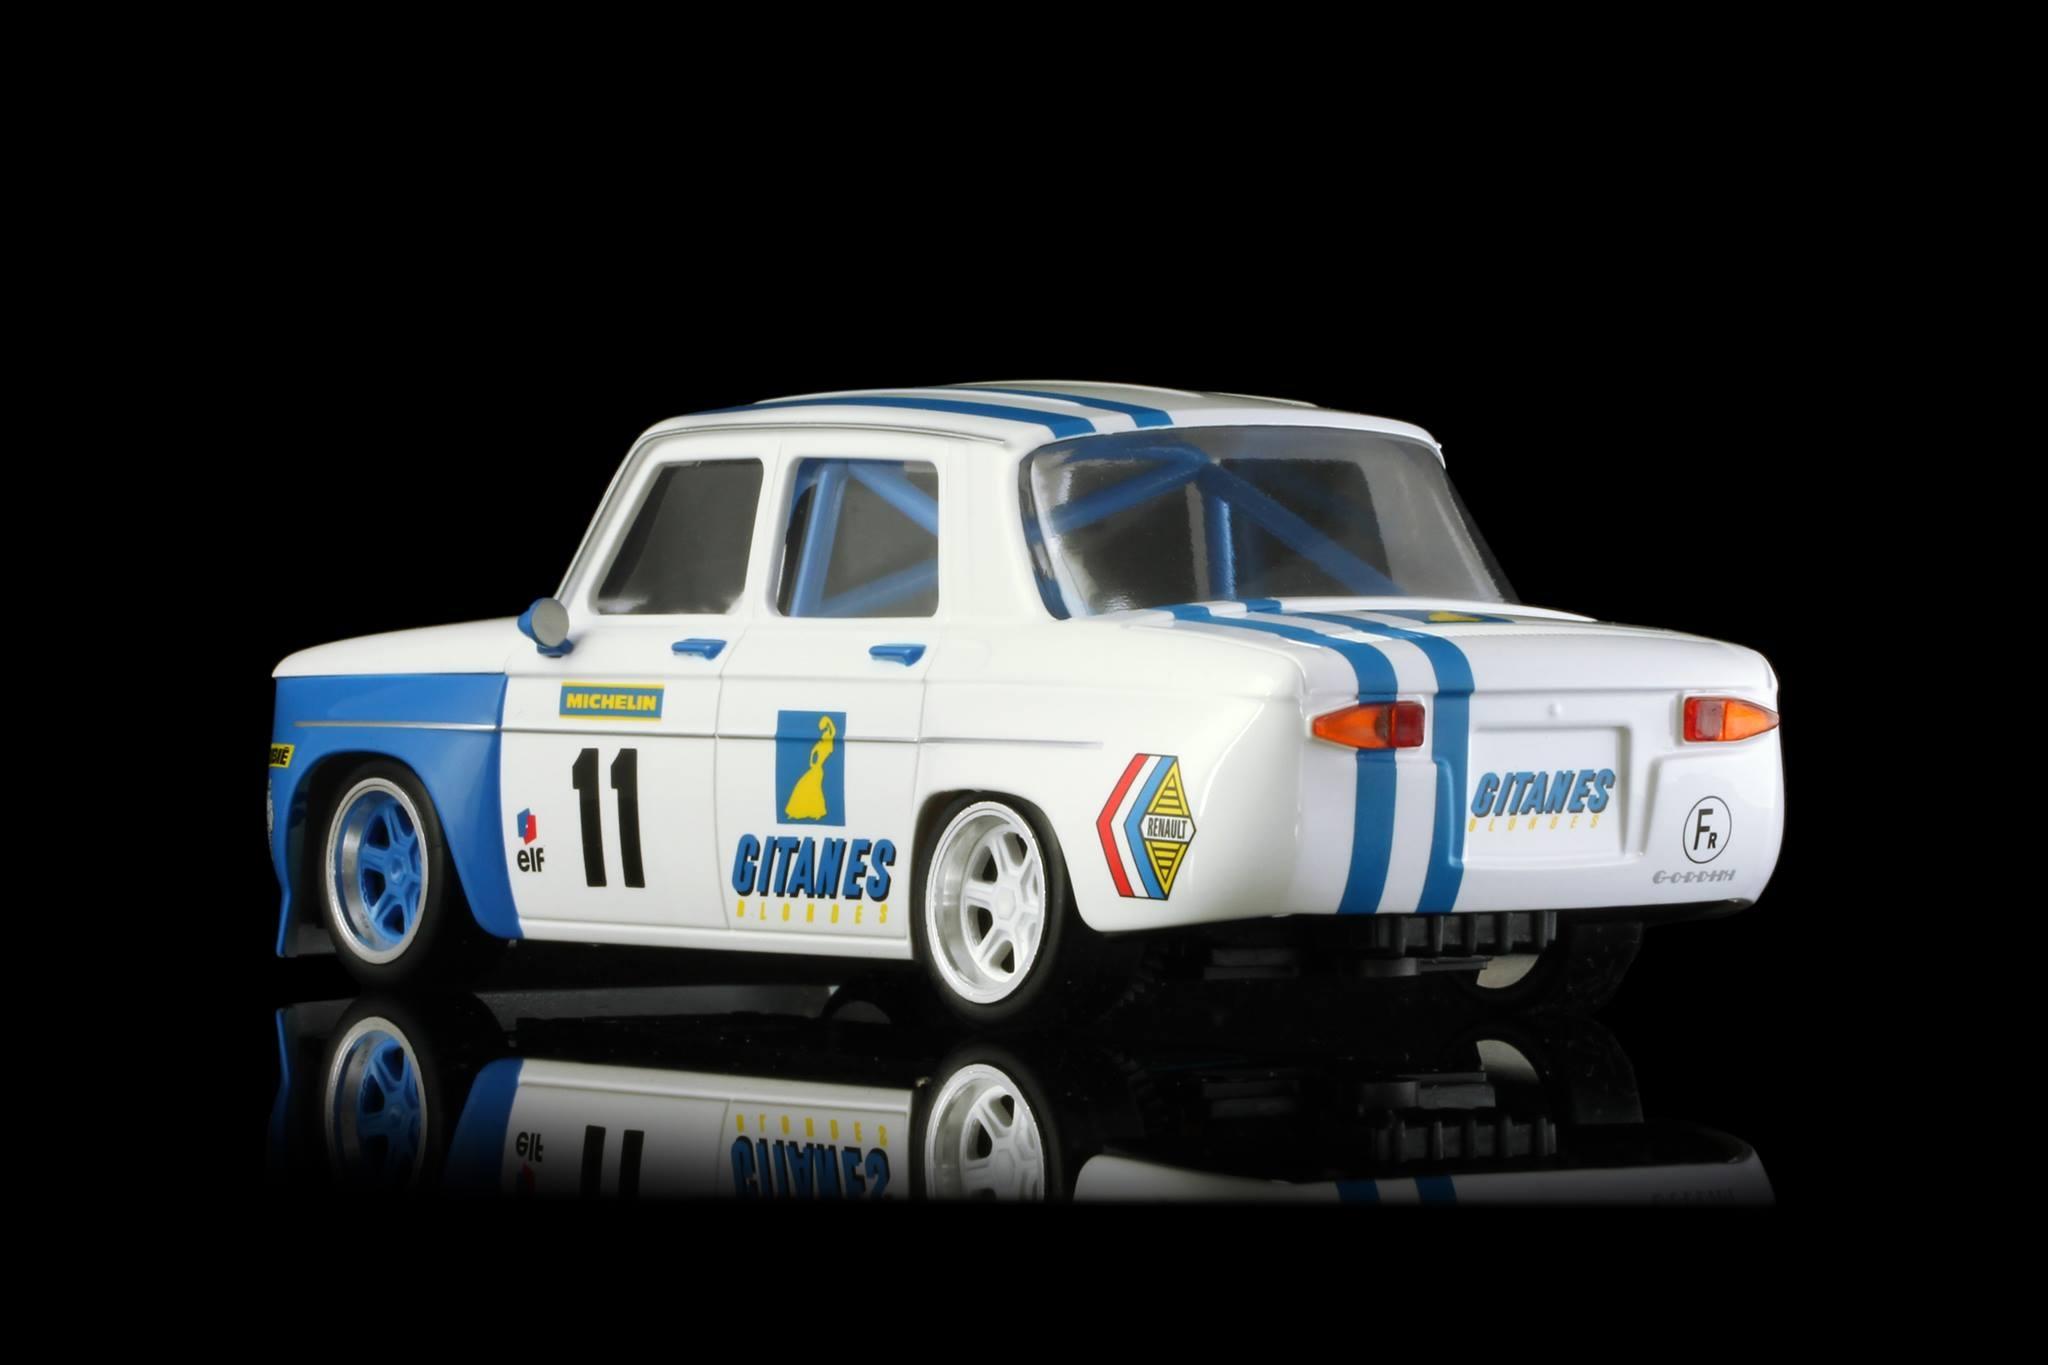 Renault R8 GORDINI Gitanes # 11